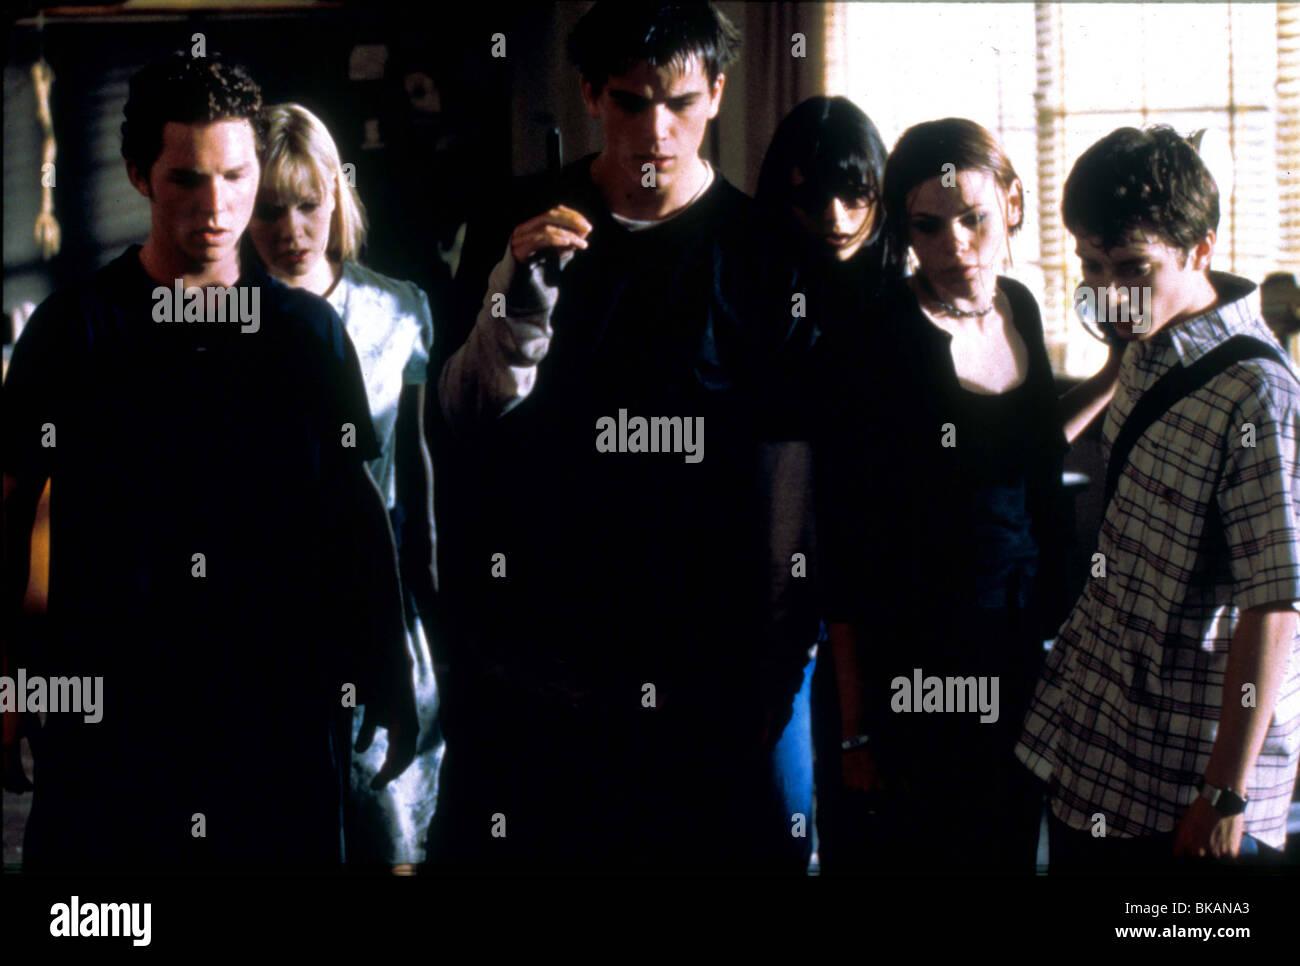 THE FACULTY (1999) SHAWN HATOSY, LAURA HARRIS, JOSH HARTNETT, JORDANA BREWSTER, CLEA DU VALL, ELIJAH WOOD. FACU - Stock Image